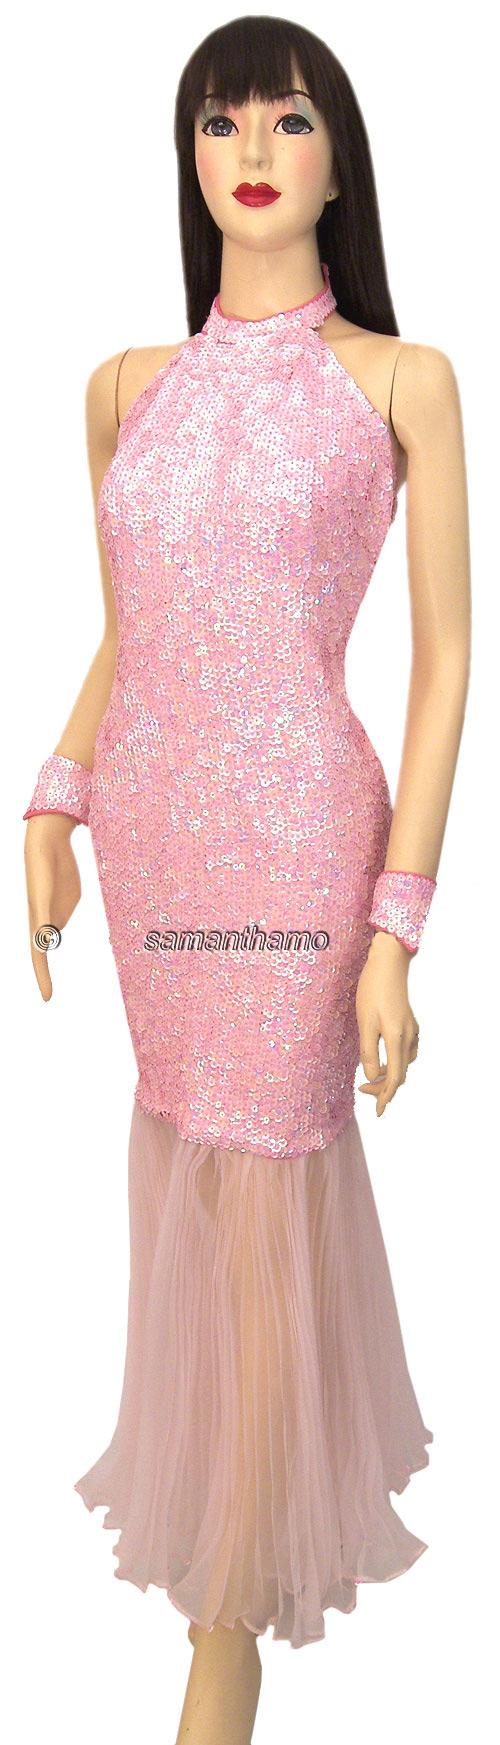 https://michaeljacksoncelebrityclothing.com/sequin-drag-ball-gown/TM2030-sequin-dance-dress.jpg